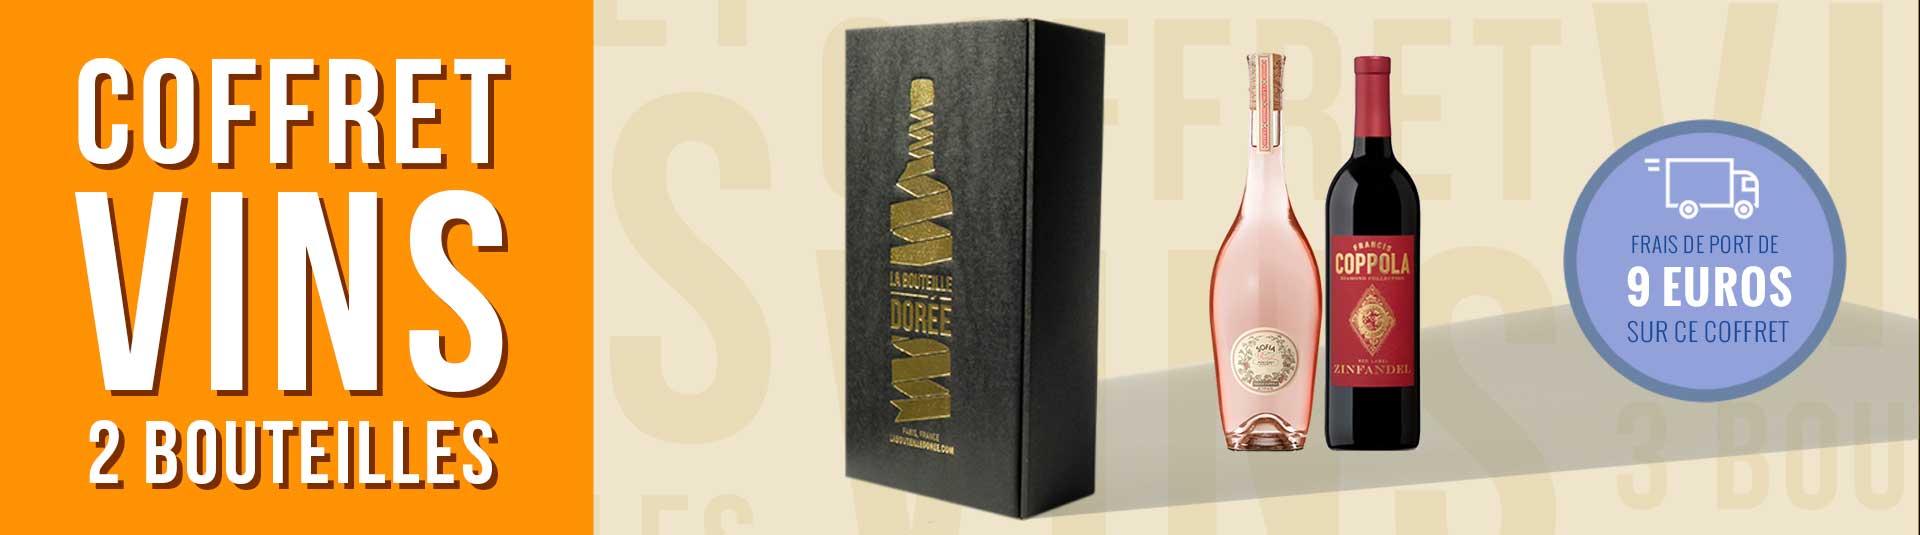 Coffret vin USA Francis Ford Coppola 2 bouteilles